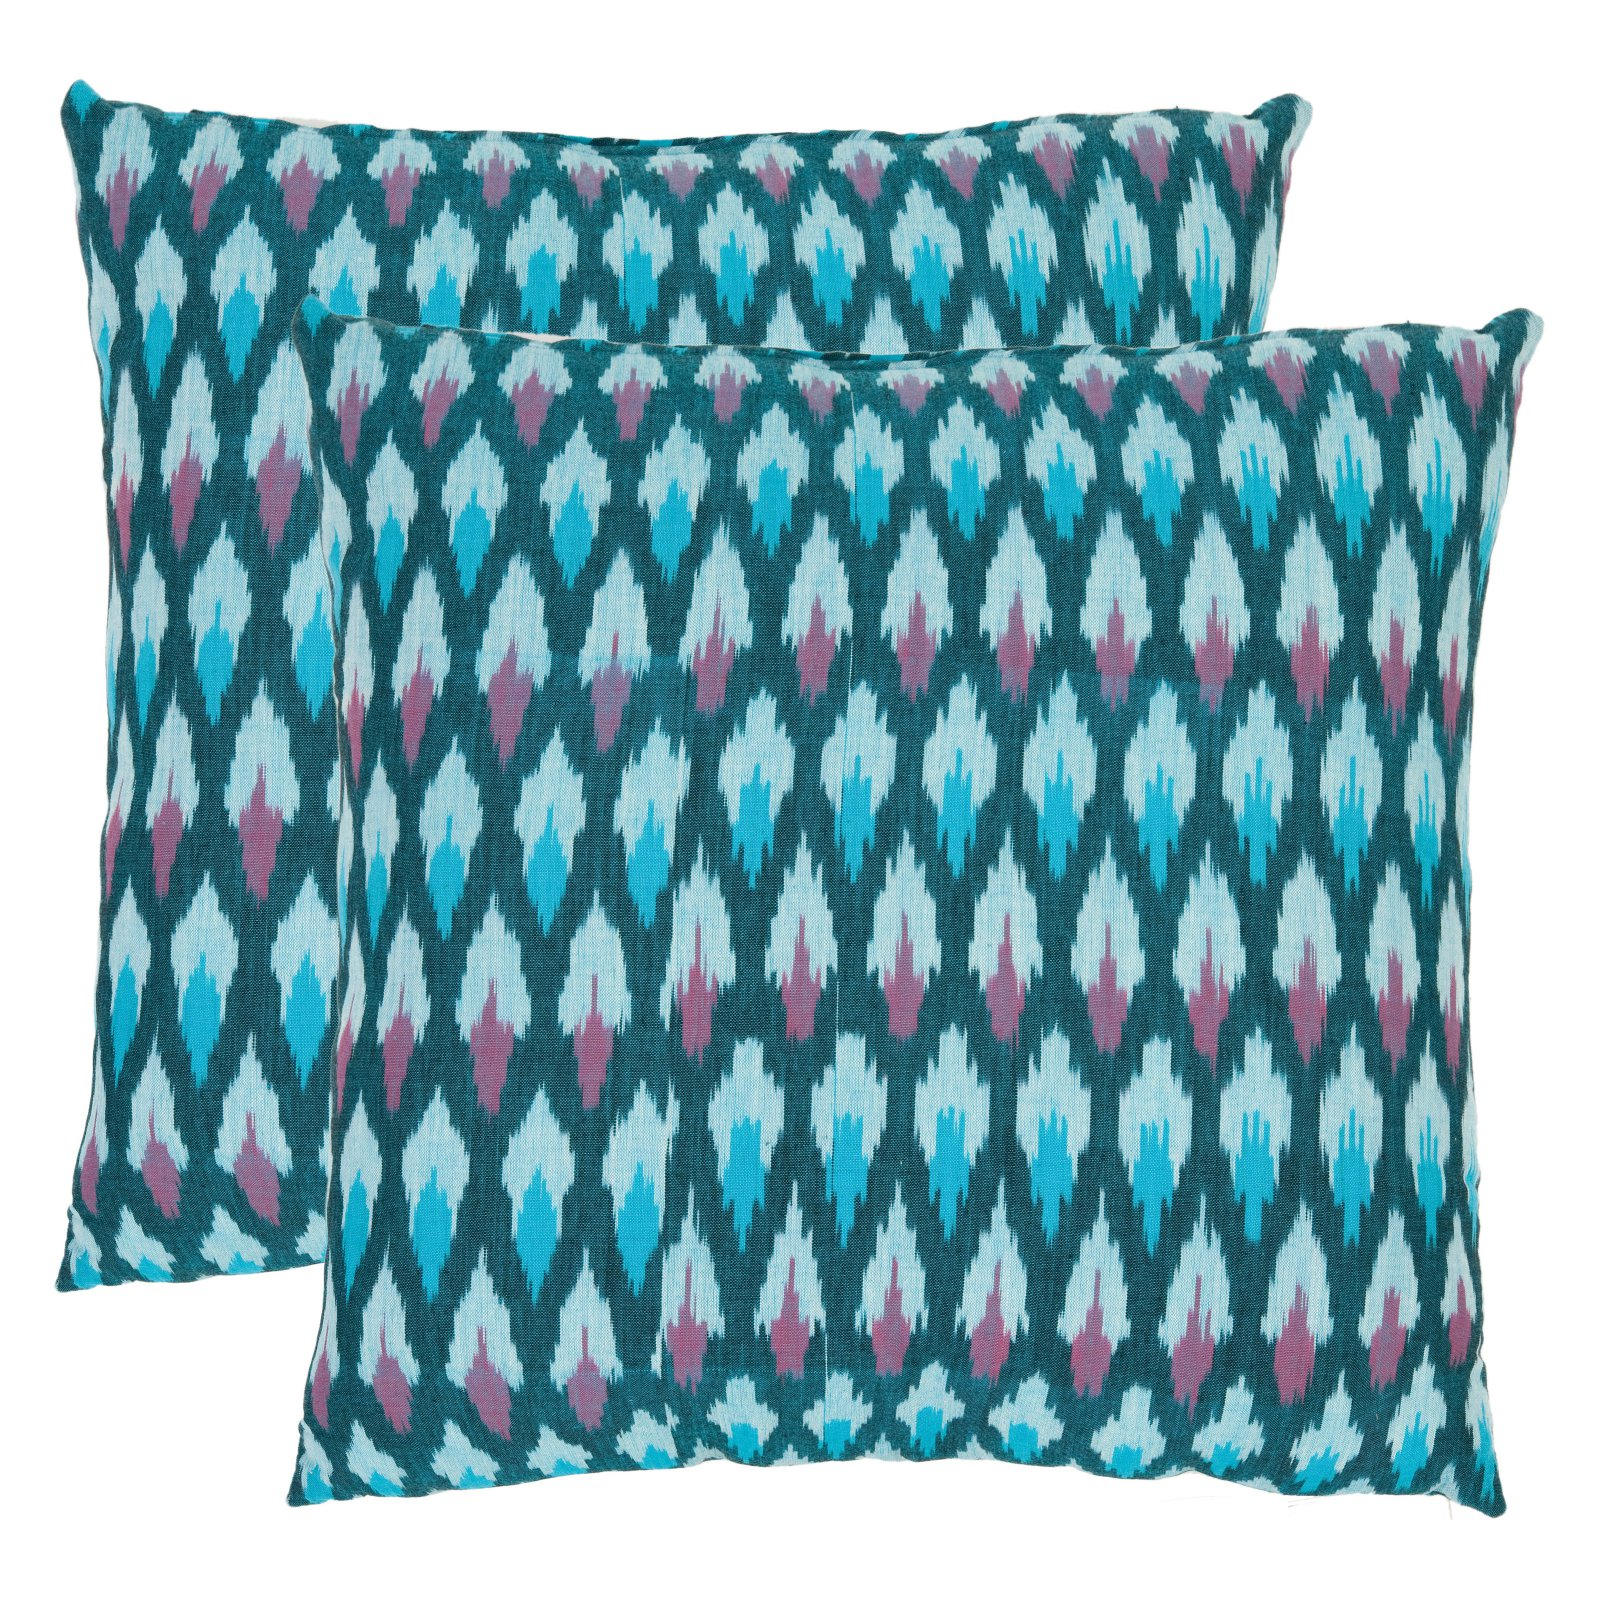 Safavieh Taylor Blue Decorative Pillows - Set of 2